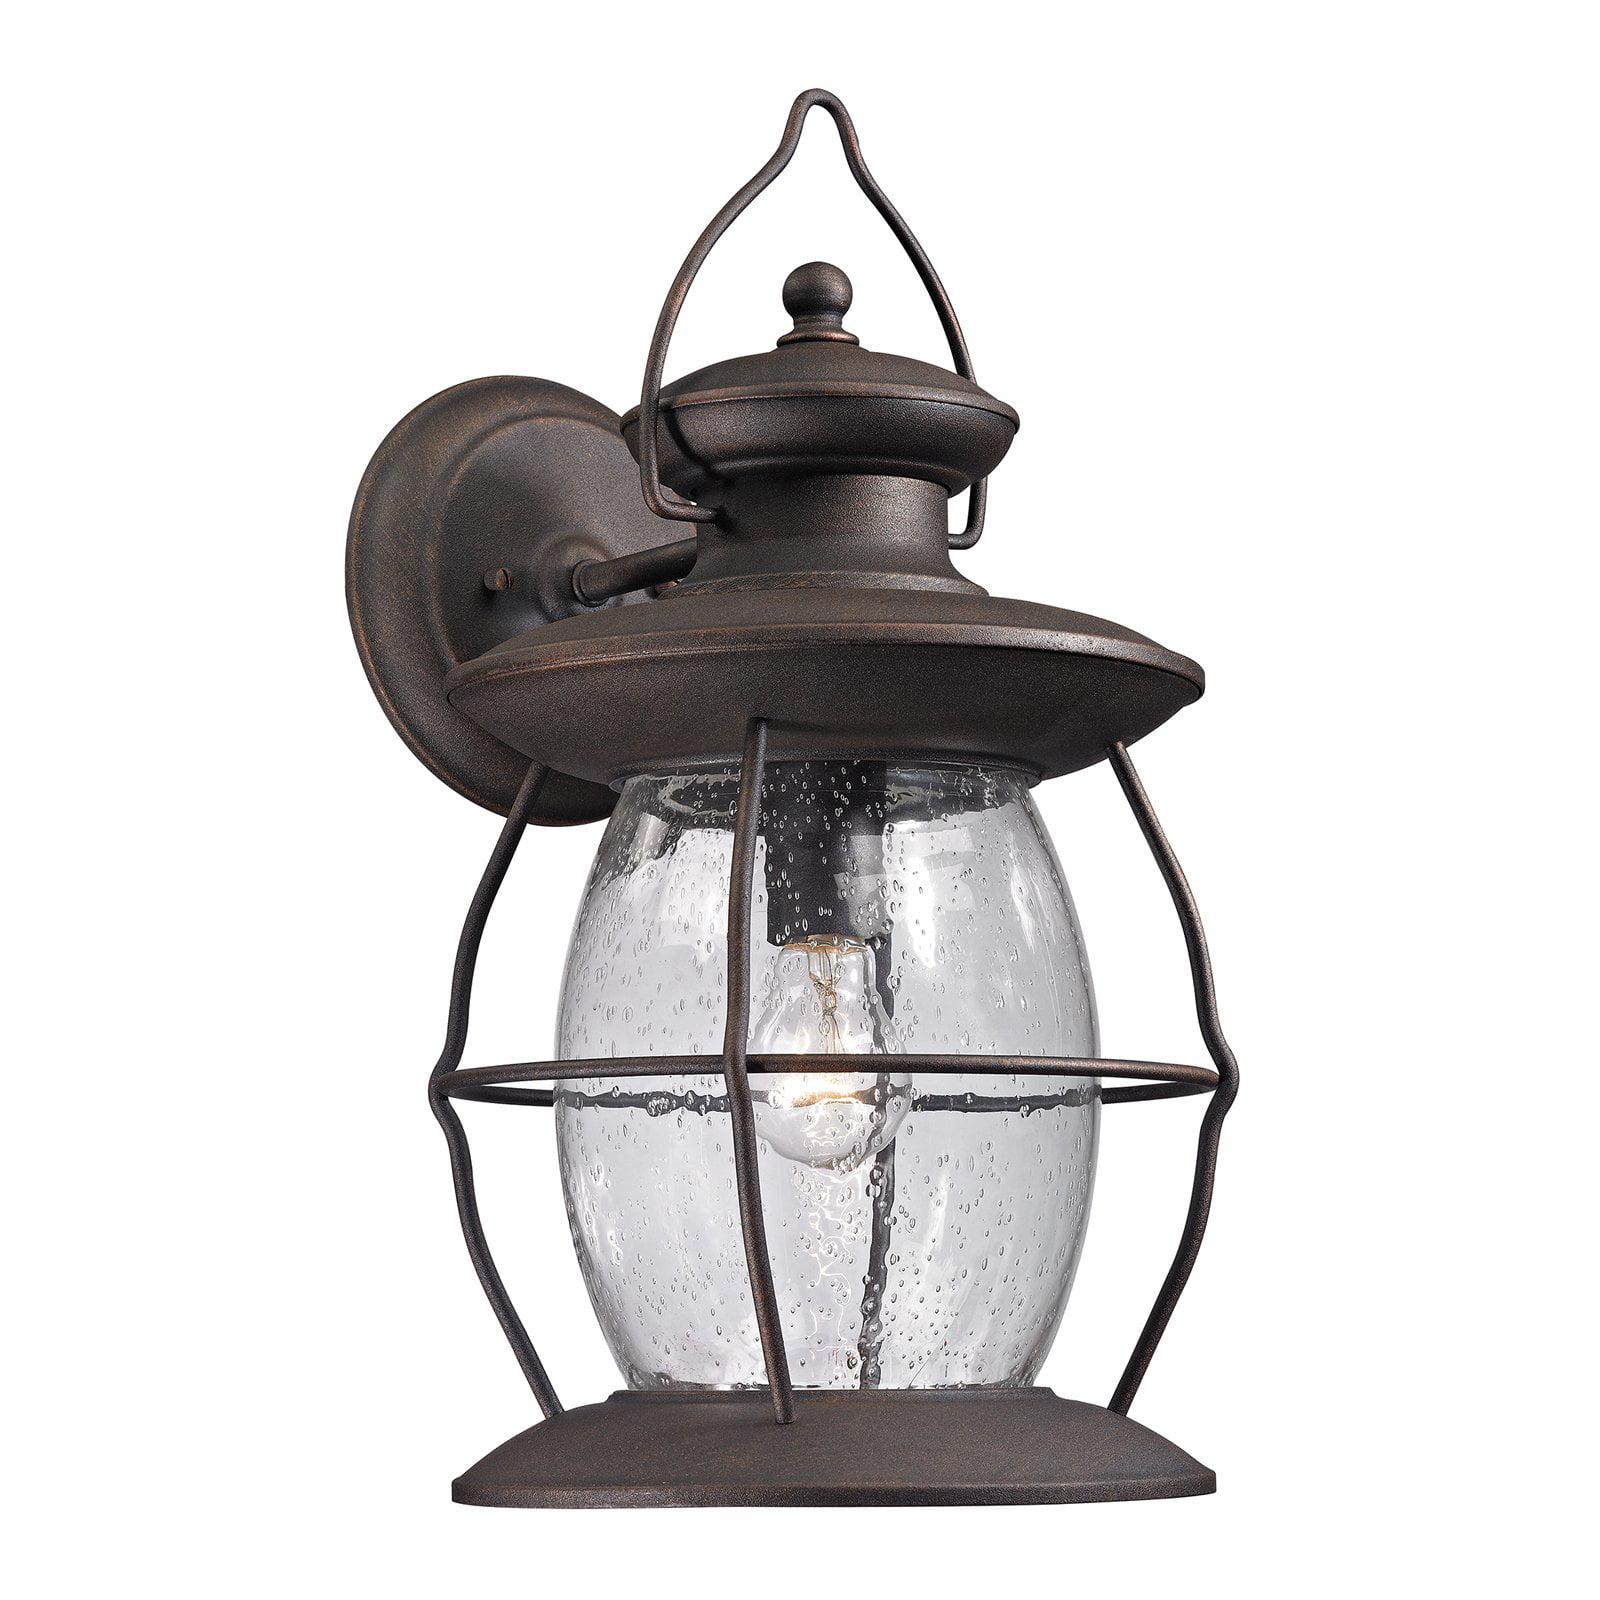 ELK Lighting Village Lantern 47044 1 1-Light Outdoor Wall Sconce by Elk Lighting